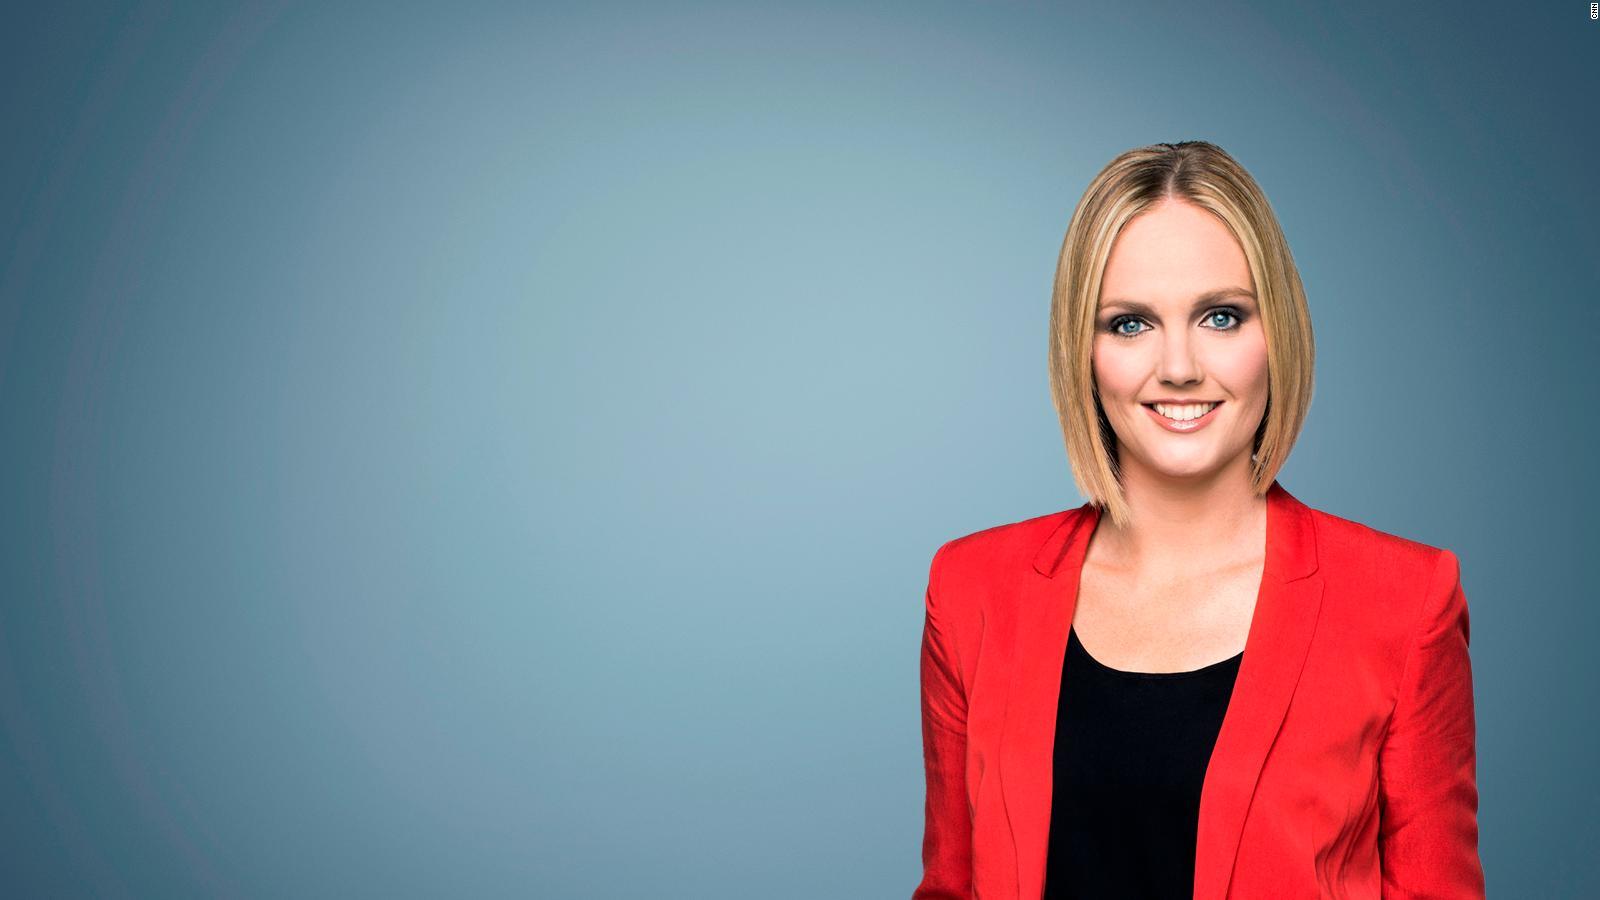 Amanda Page Real Name cnn profiles - amanda davies - sports anchor - cnn